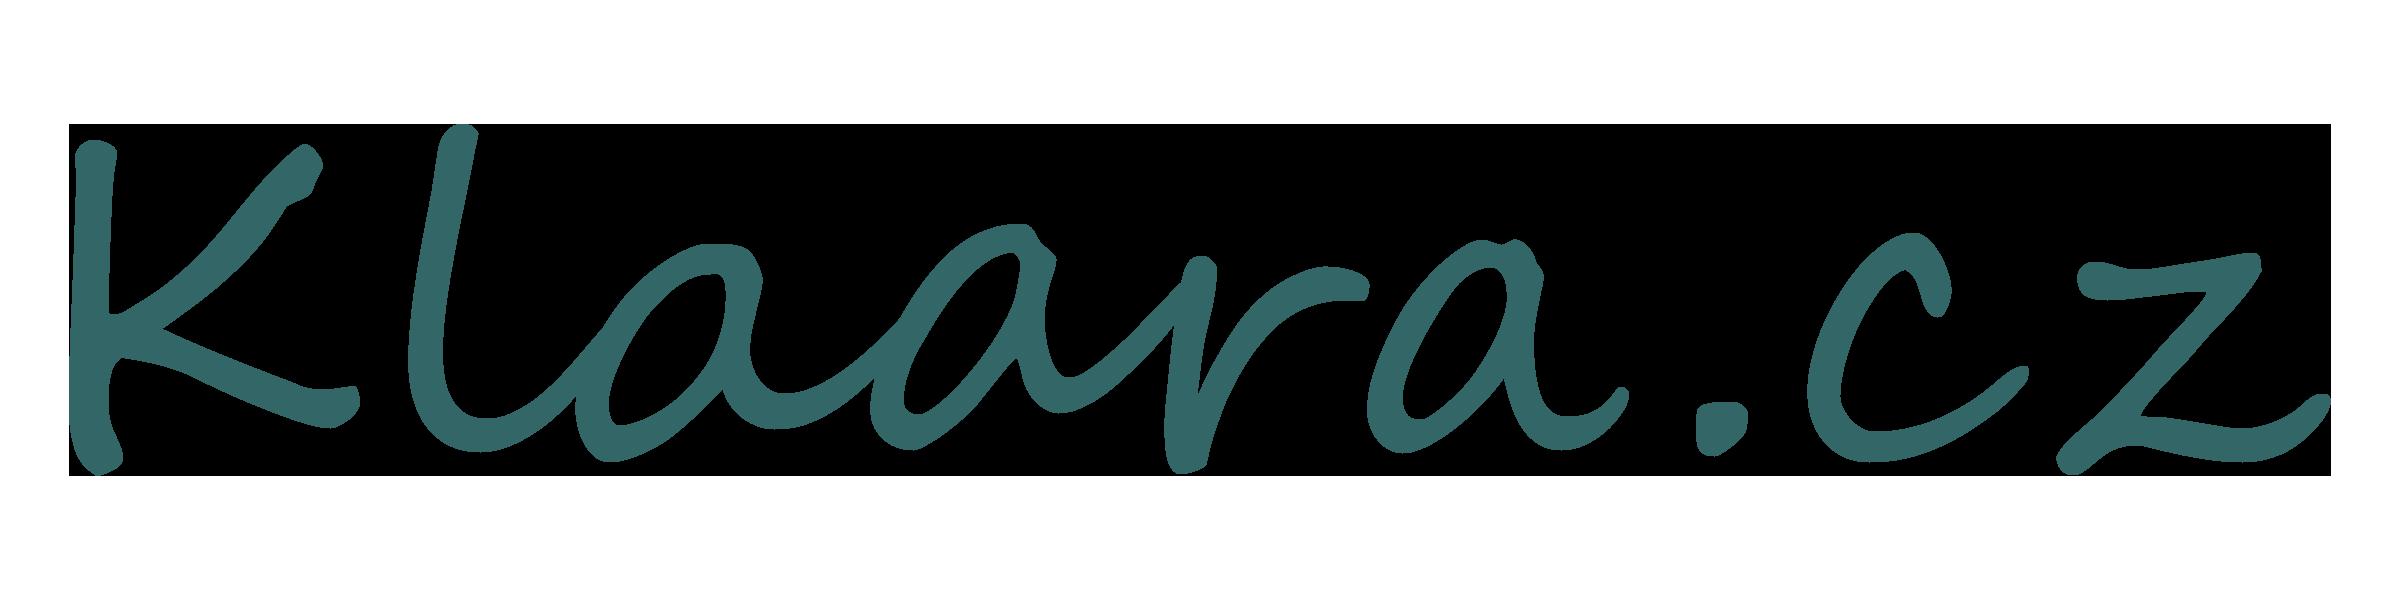 logo klaara.cz